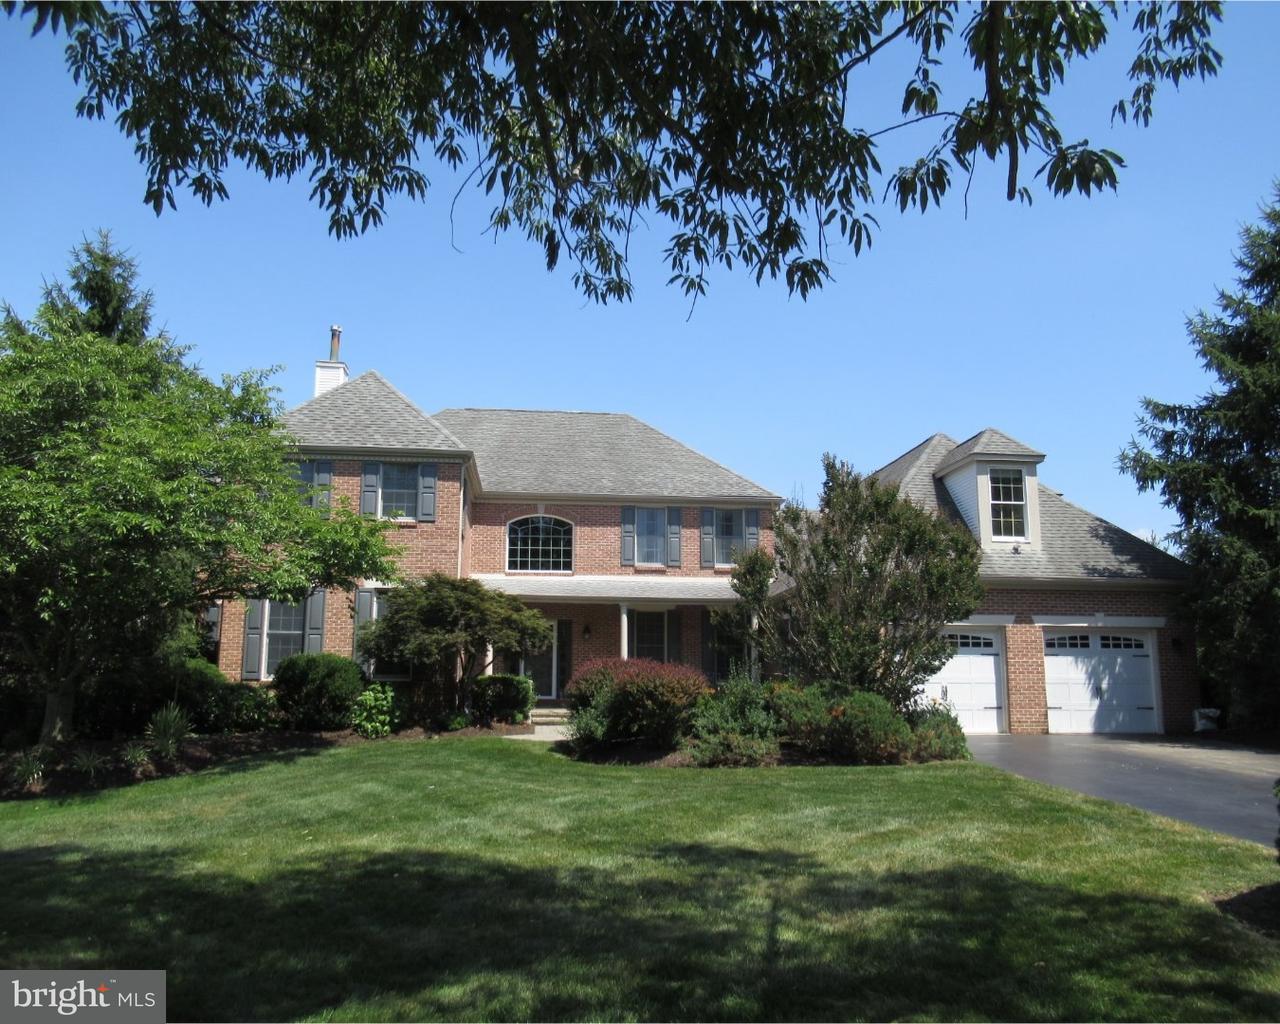 独户住宅 为 销售 在 111 S LONGFELLOW Drive Princeton Junction, 新泽西州 08550 美国在/周边: West Windsor Twp